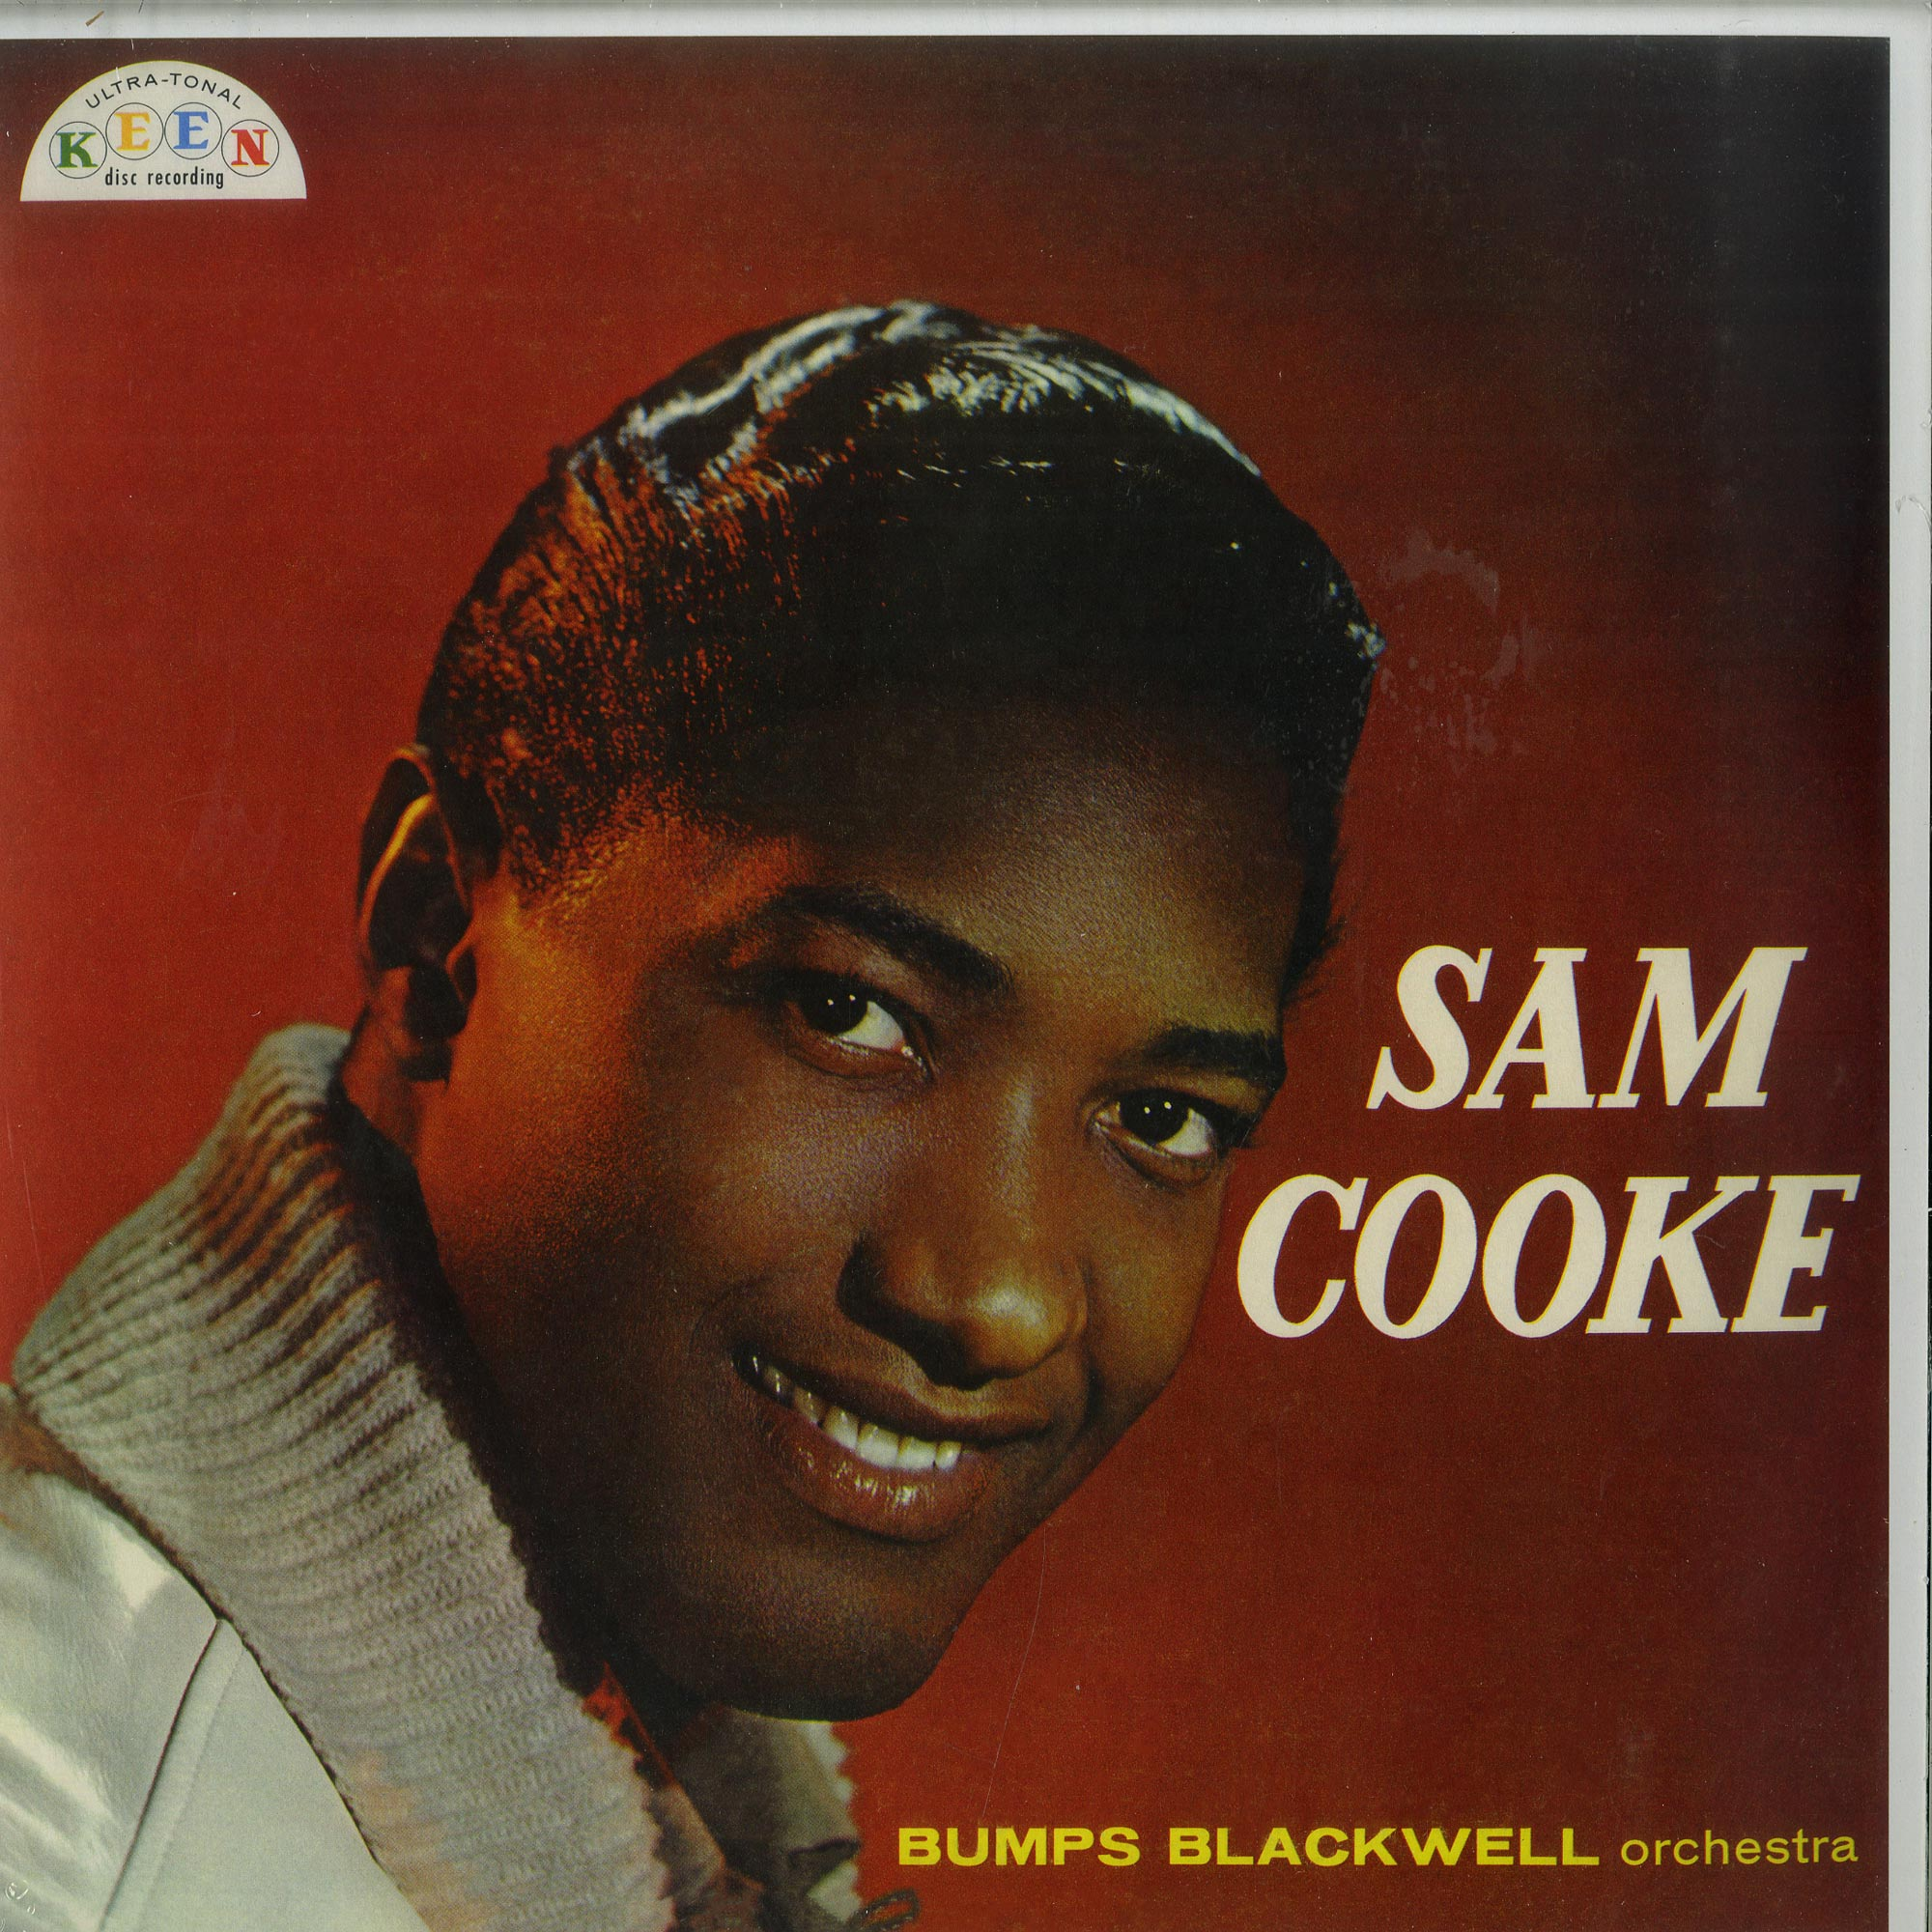 Sam Cooke - SAM COOKE